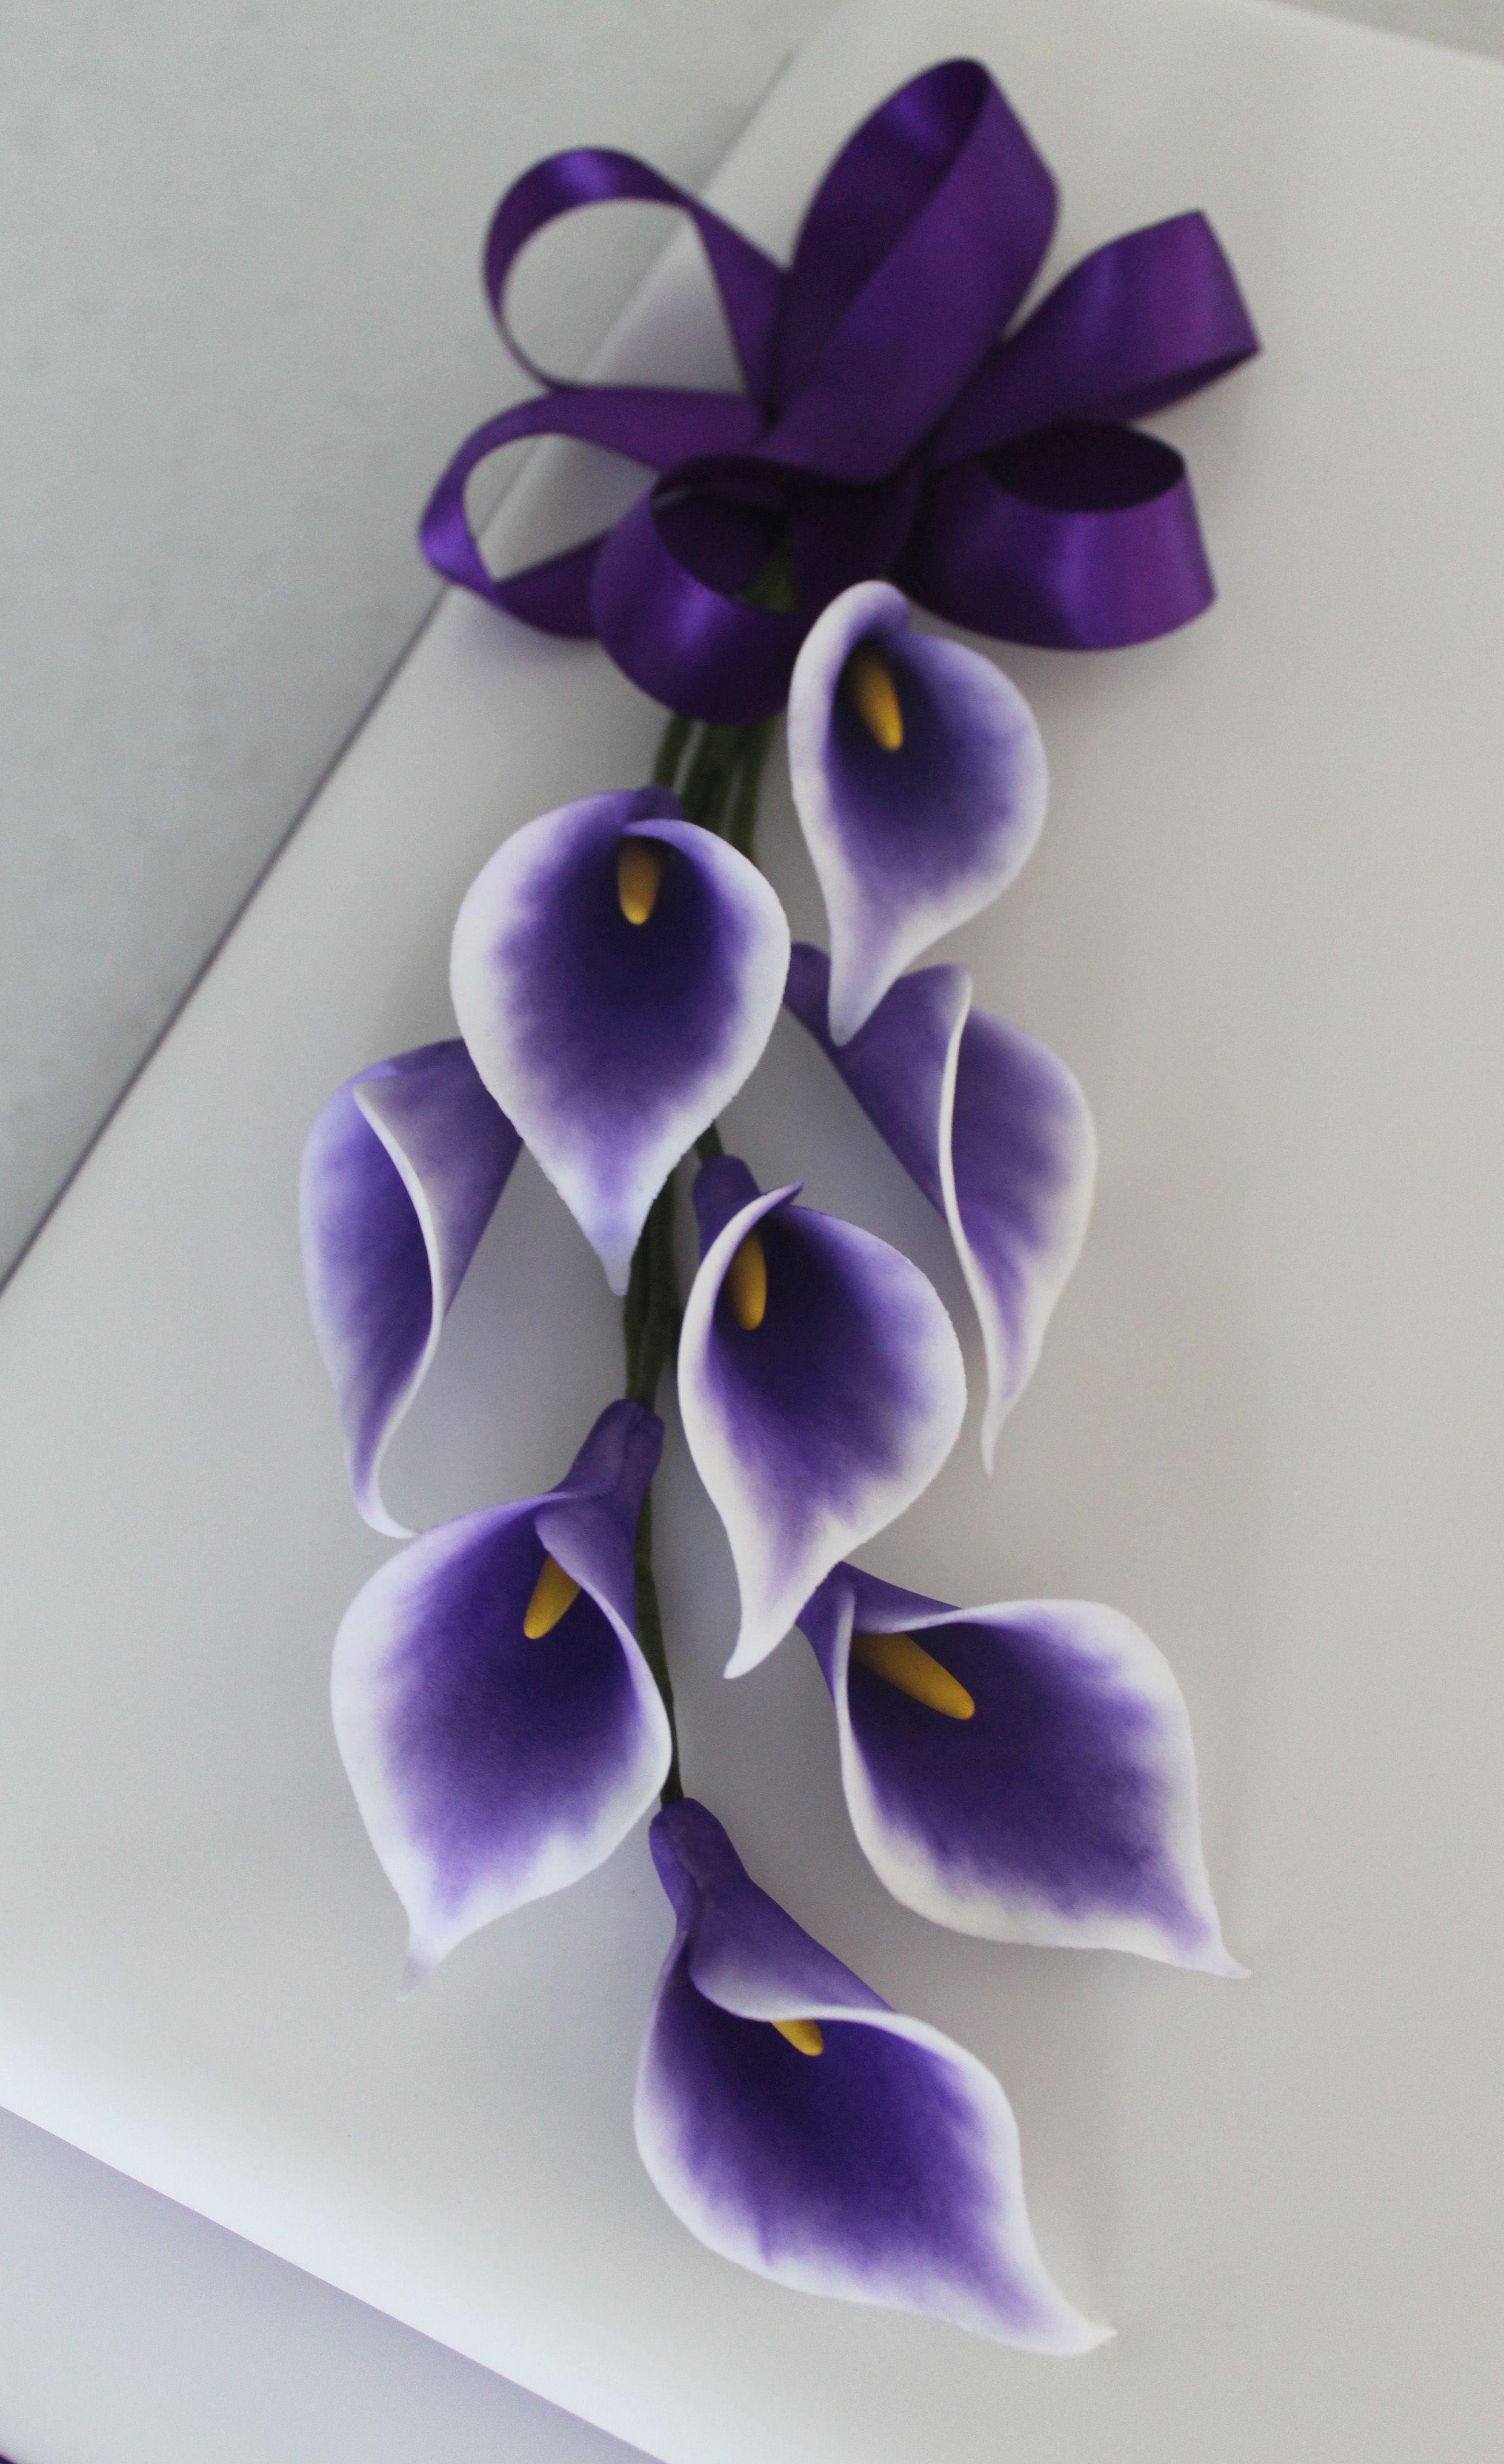 Handmade Flower Spray Purple Calla Lilies Paper Flowers Paper Flowers Diy Handmade Flowers